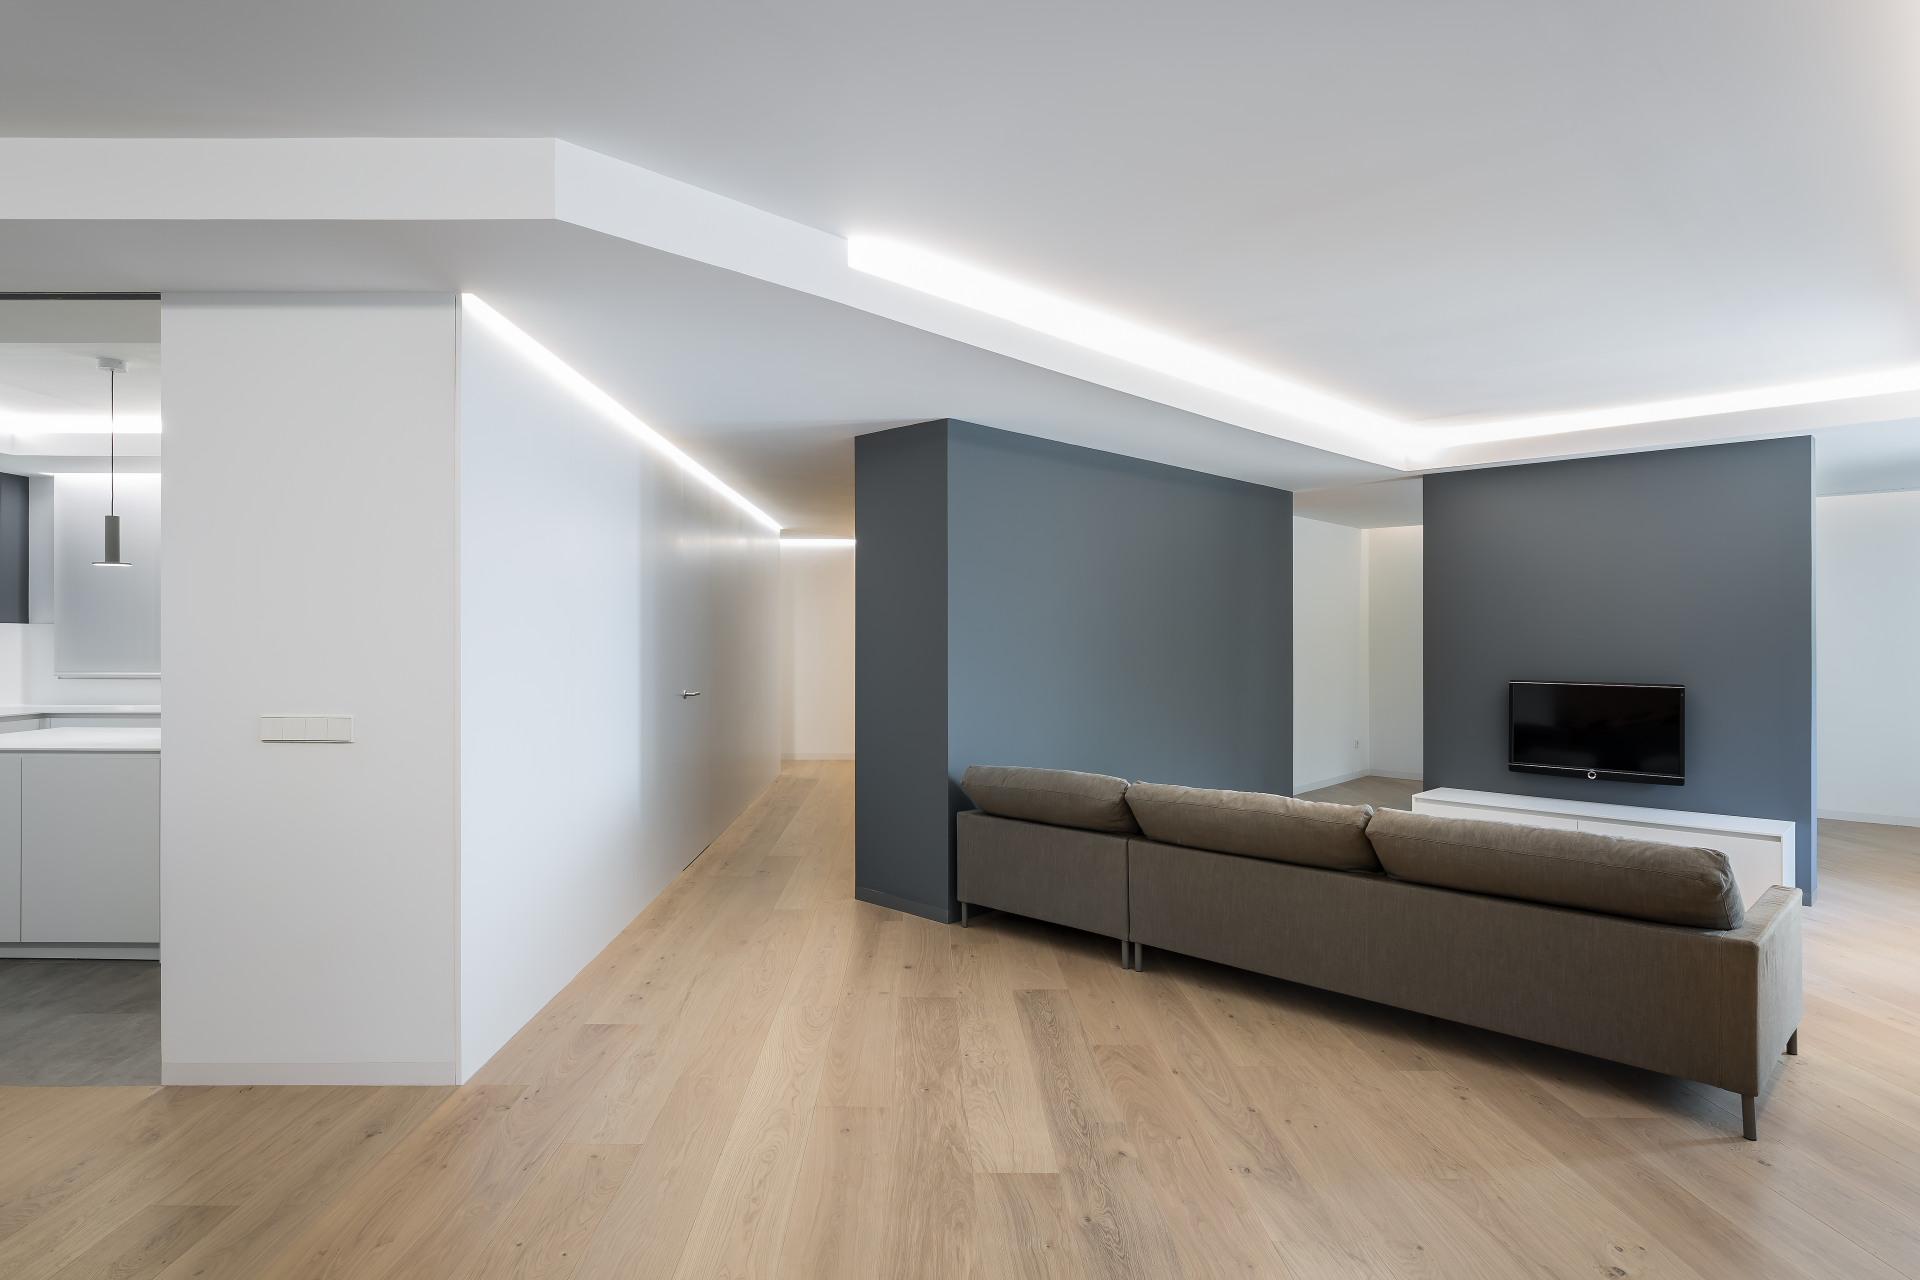 fotografia-arquitectura-interiorismo-valencia-german-cabo-gallardo-llopis-bfm-edificatoria-turia02 (12)